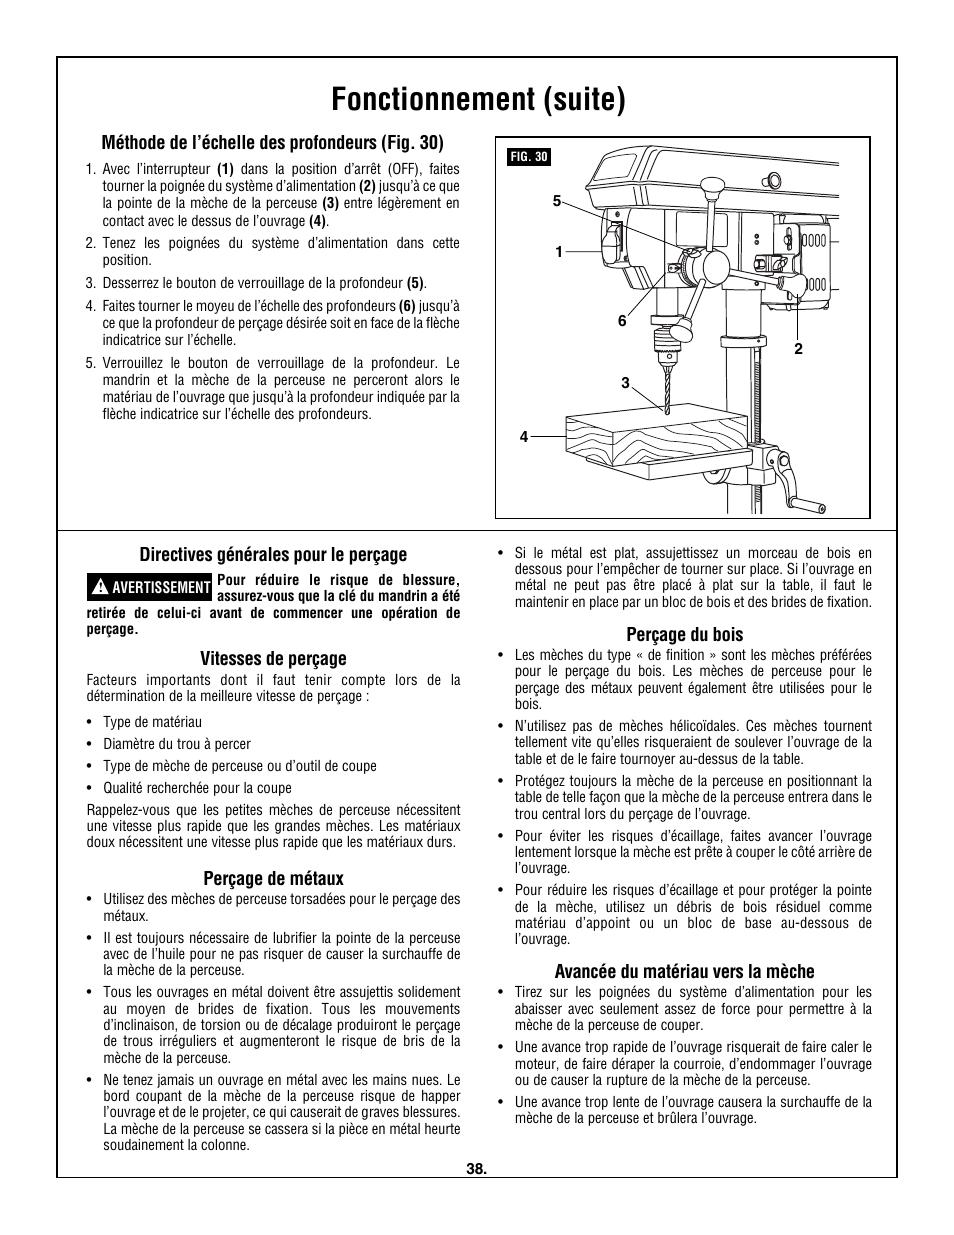 fonctionnement suite skil 3320 01 user manual page 38 60 rh manualsdir com